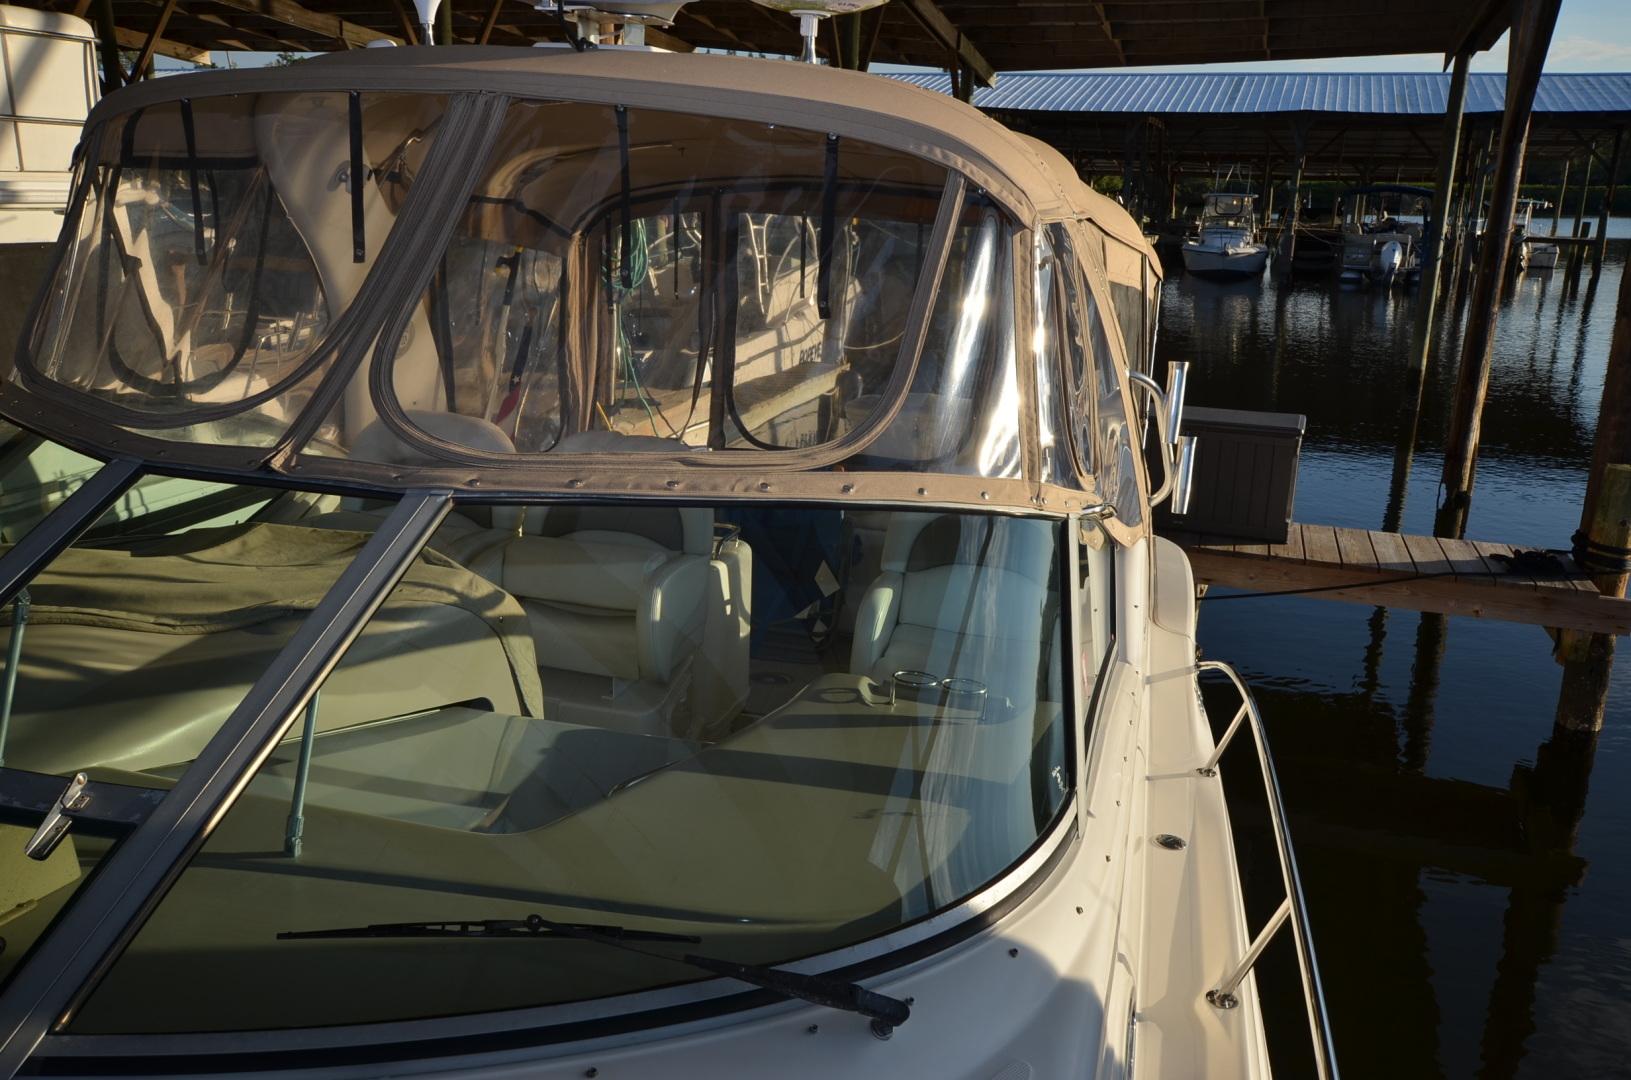 Sea Ray-340 Sundancer 2005-Better Place Palm Harbor-Florida-United States-1562850 | Thumbnail